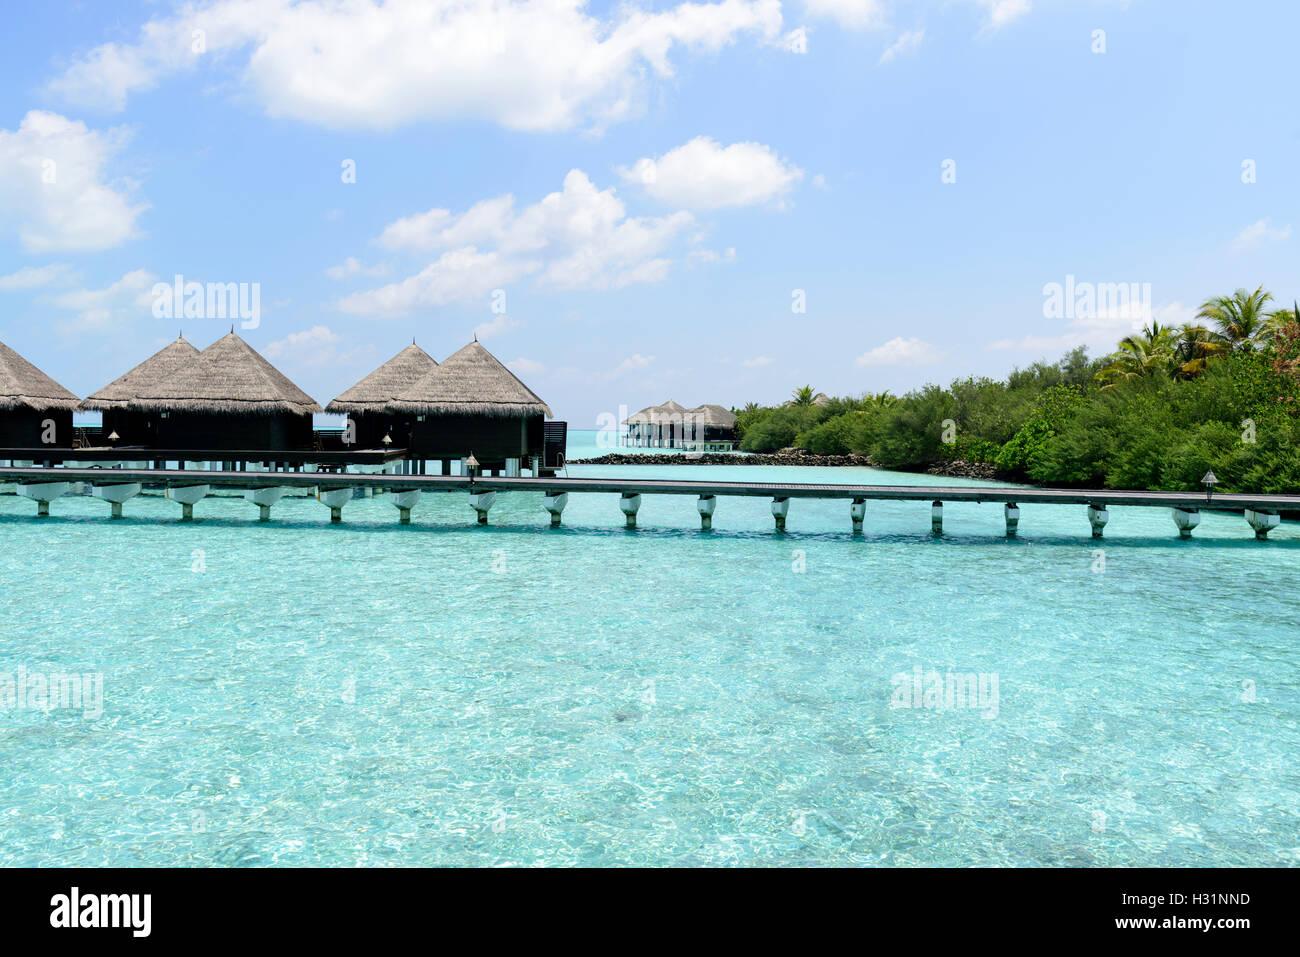 houses on piles on sea. Maldives Stock Photo